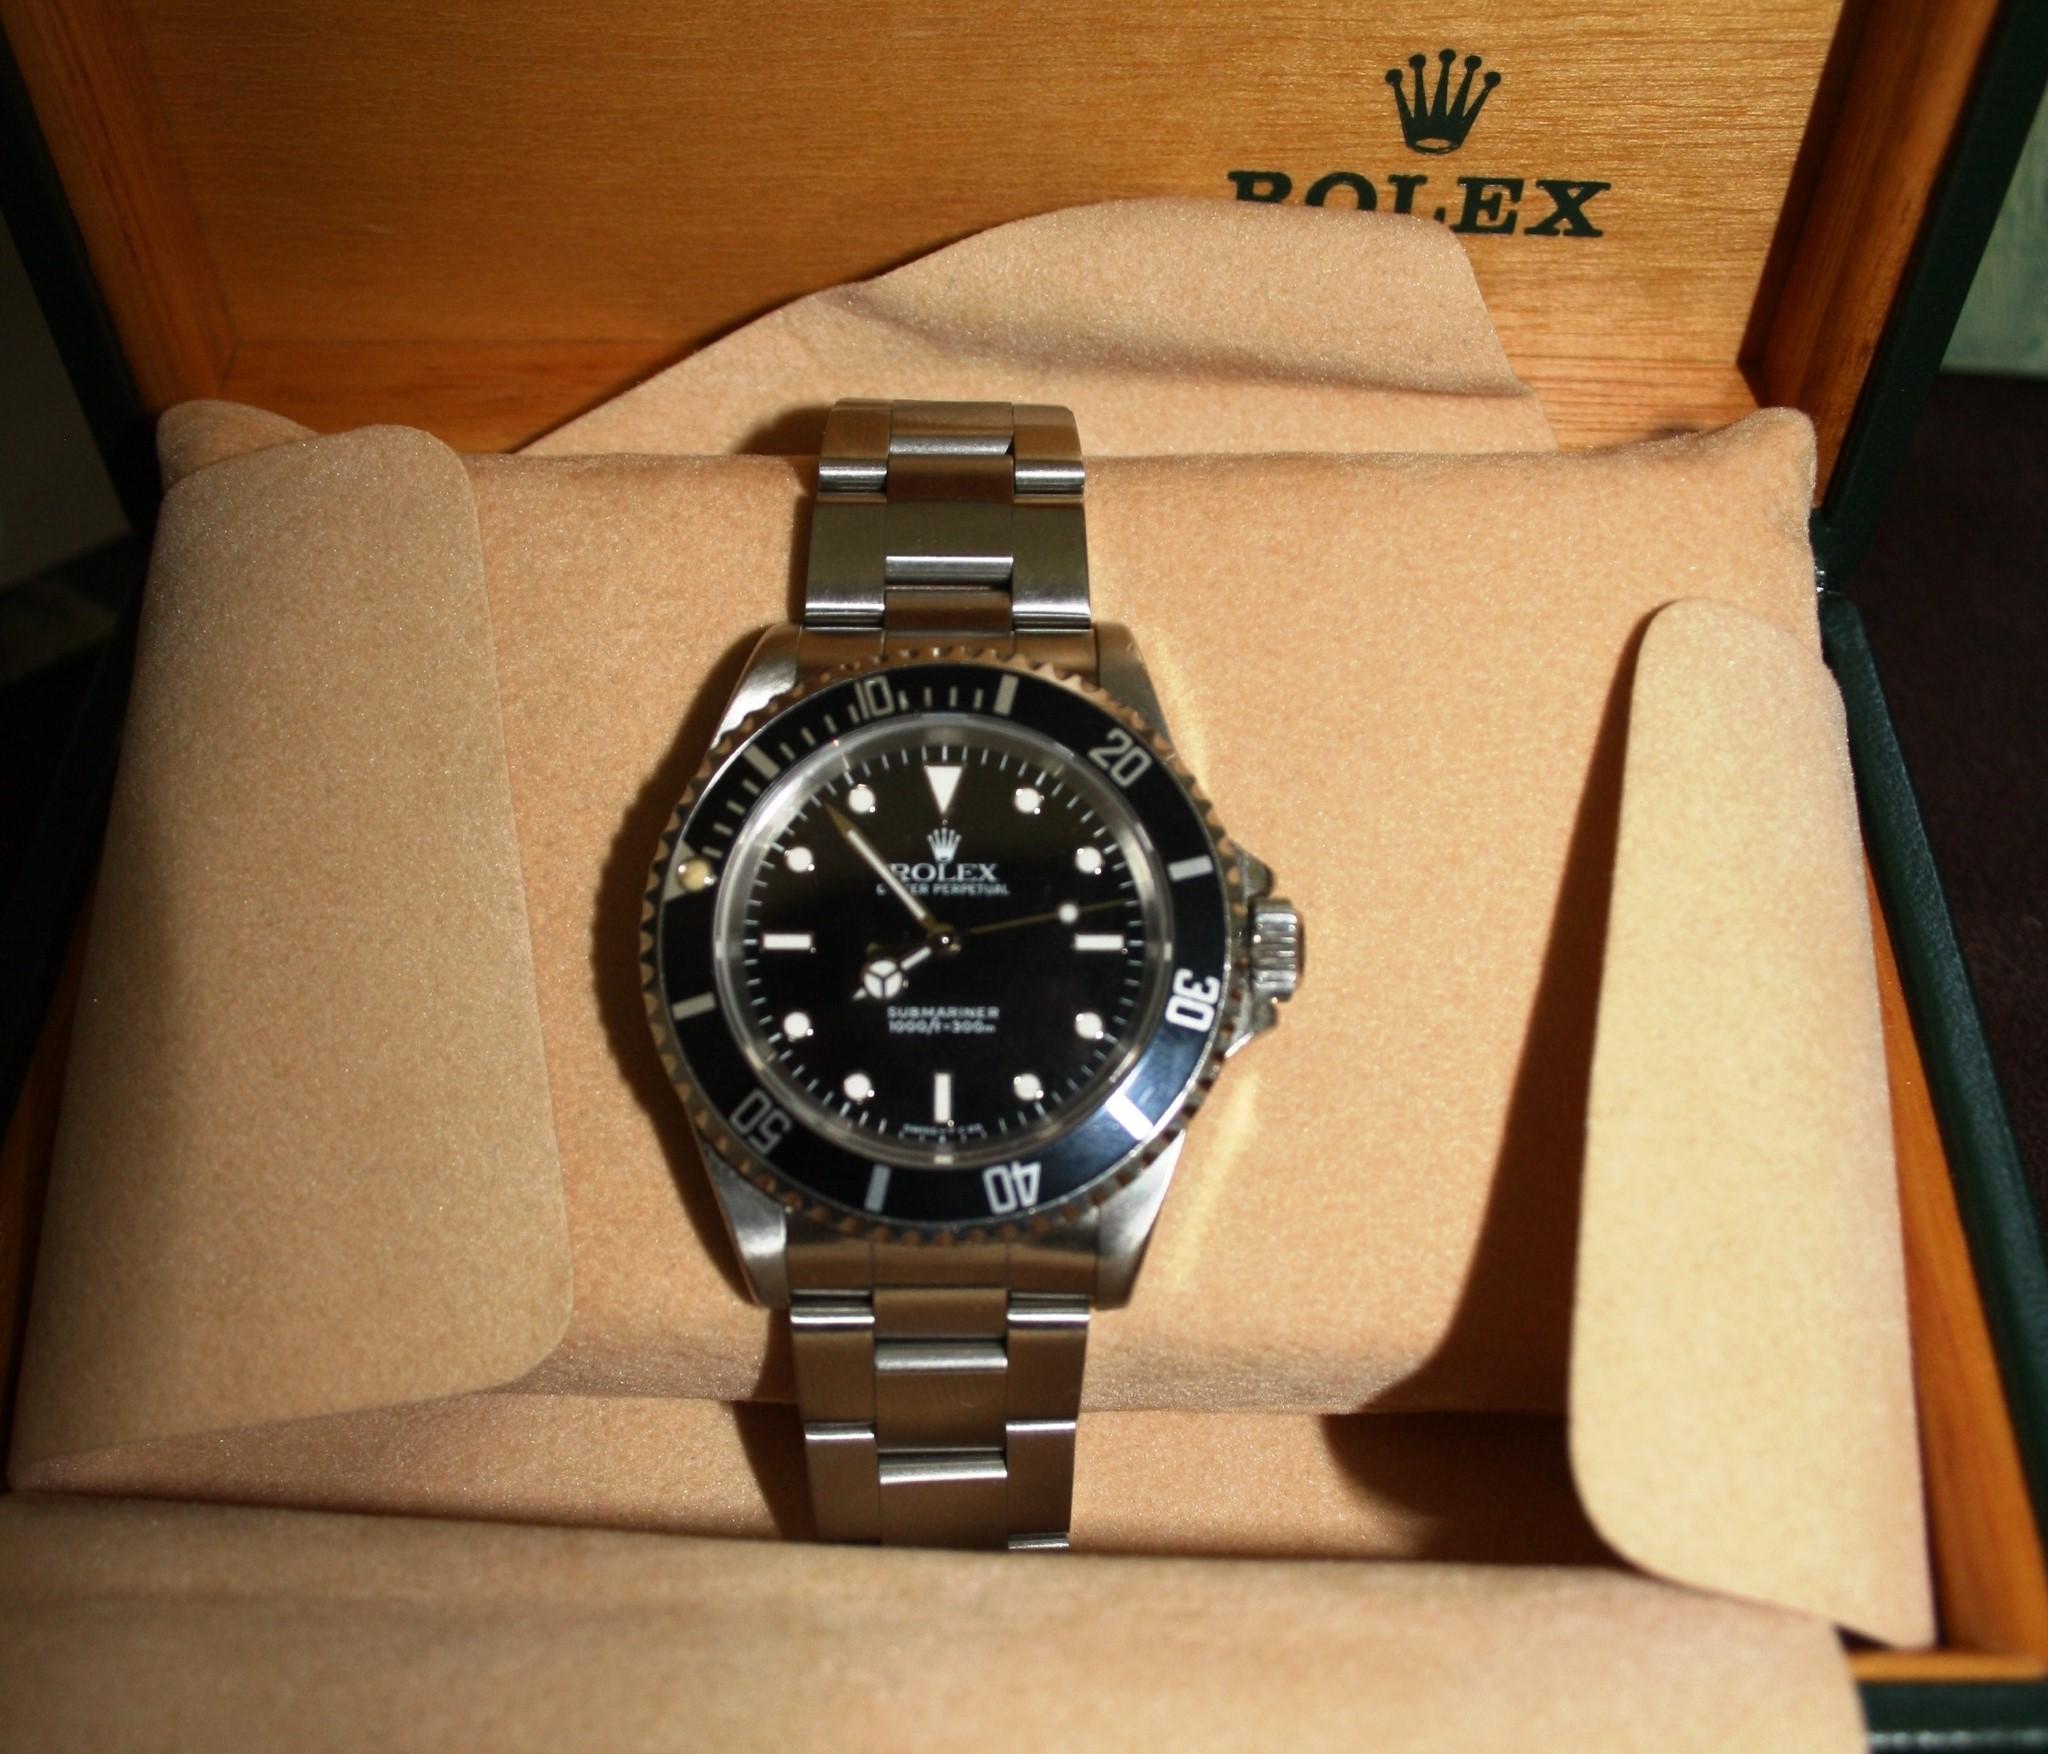 buy popular 113dc 82bea Rolex Submariner Ref.14060 - COMPRO E VENDO OROLOGI